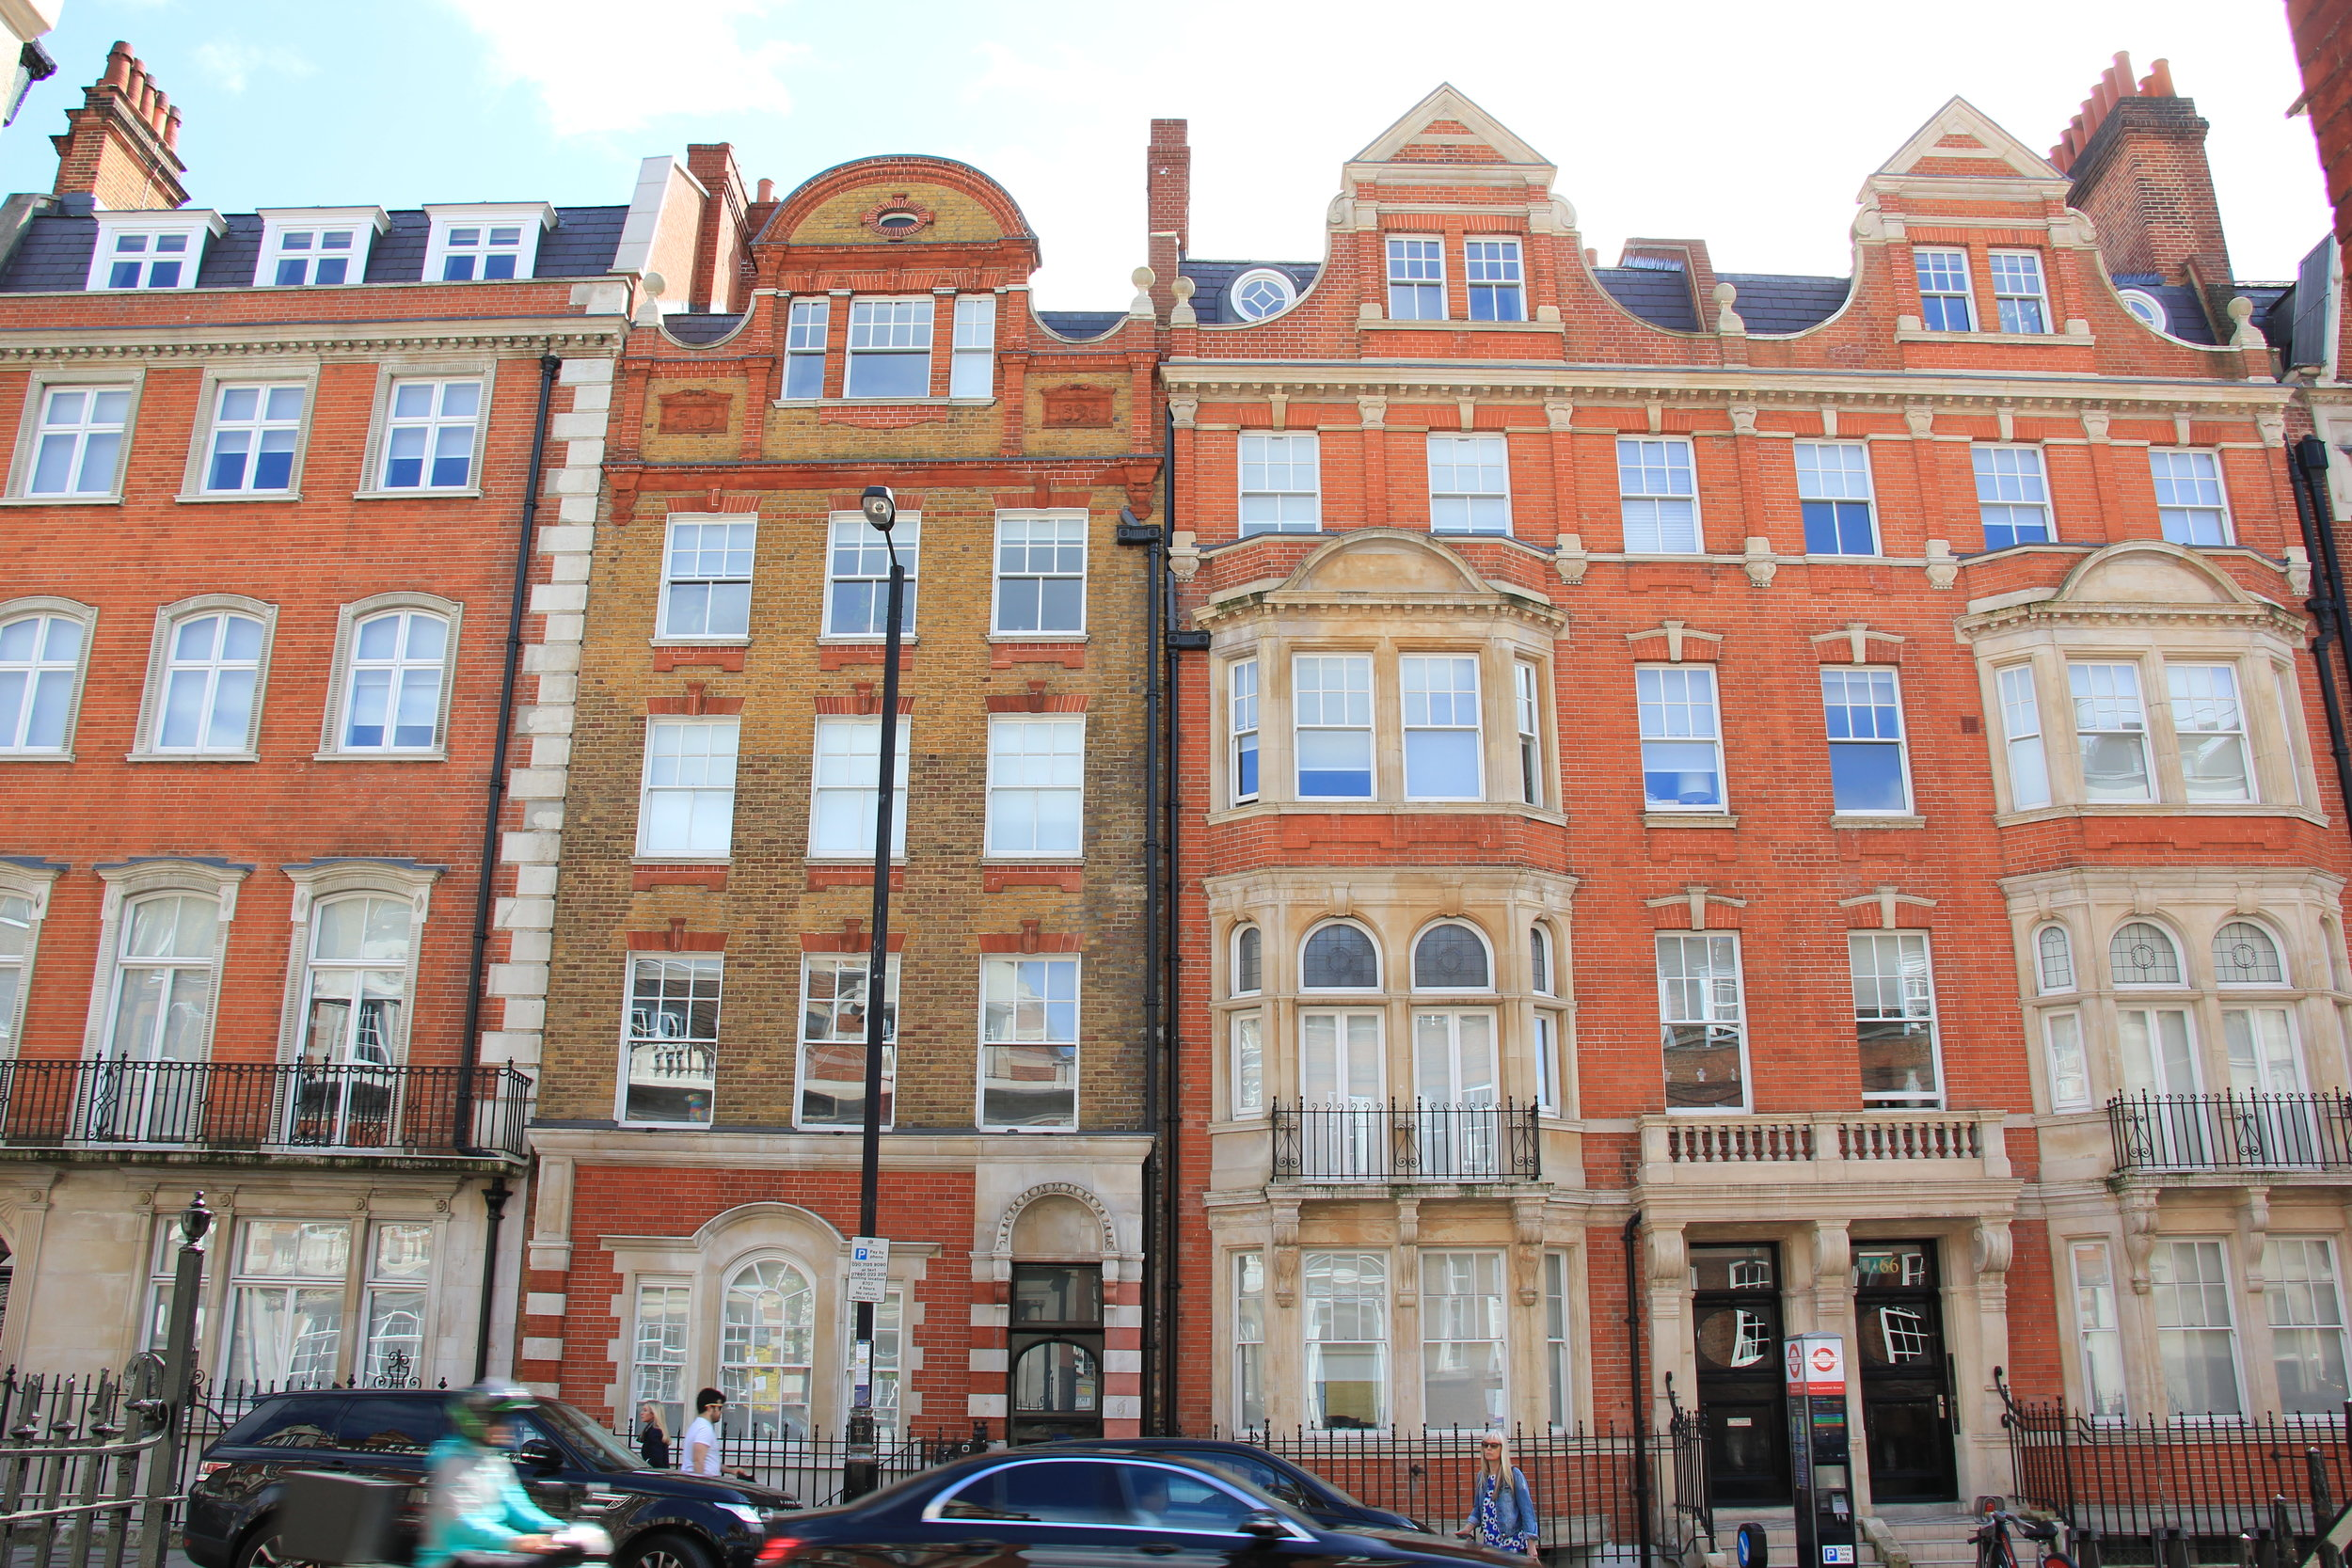 66-72 New Cavendish Street, London